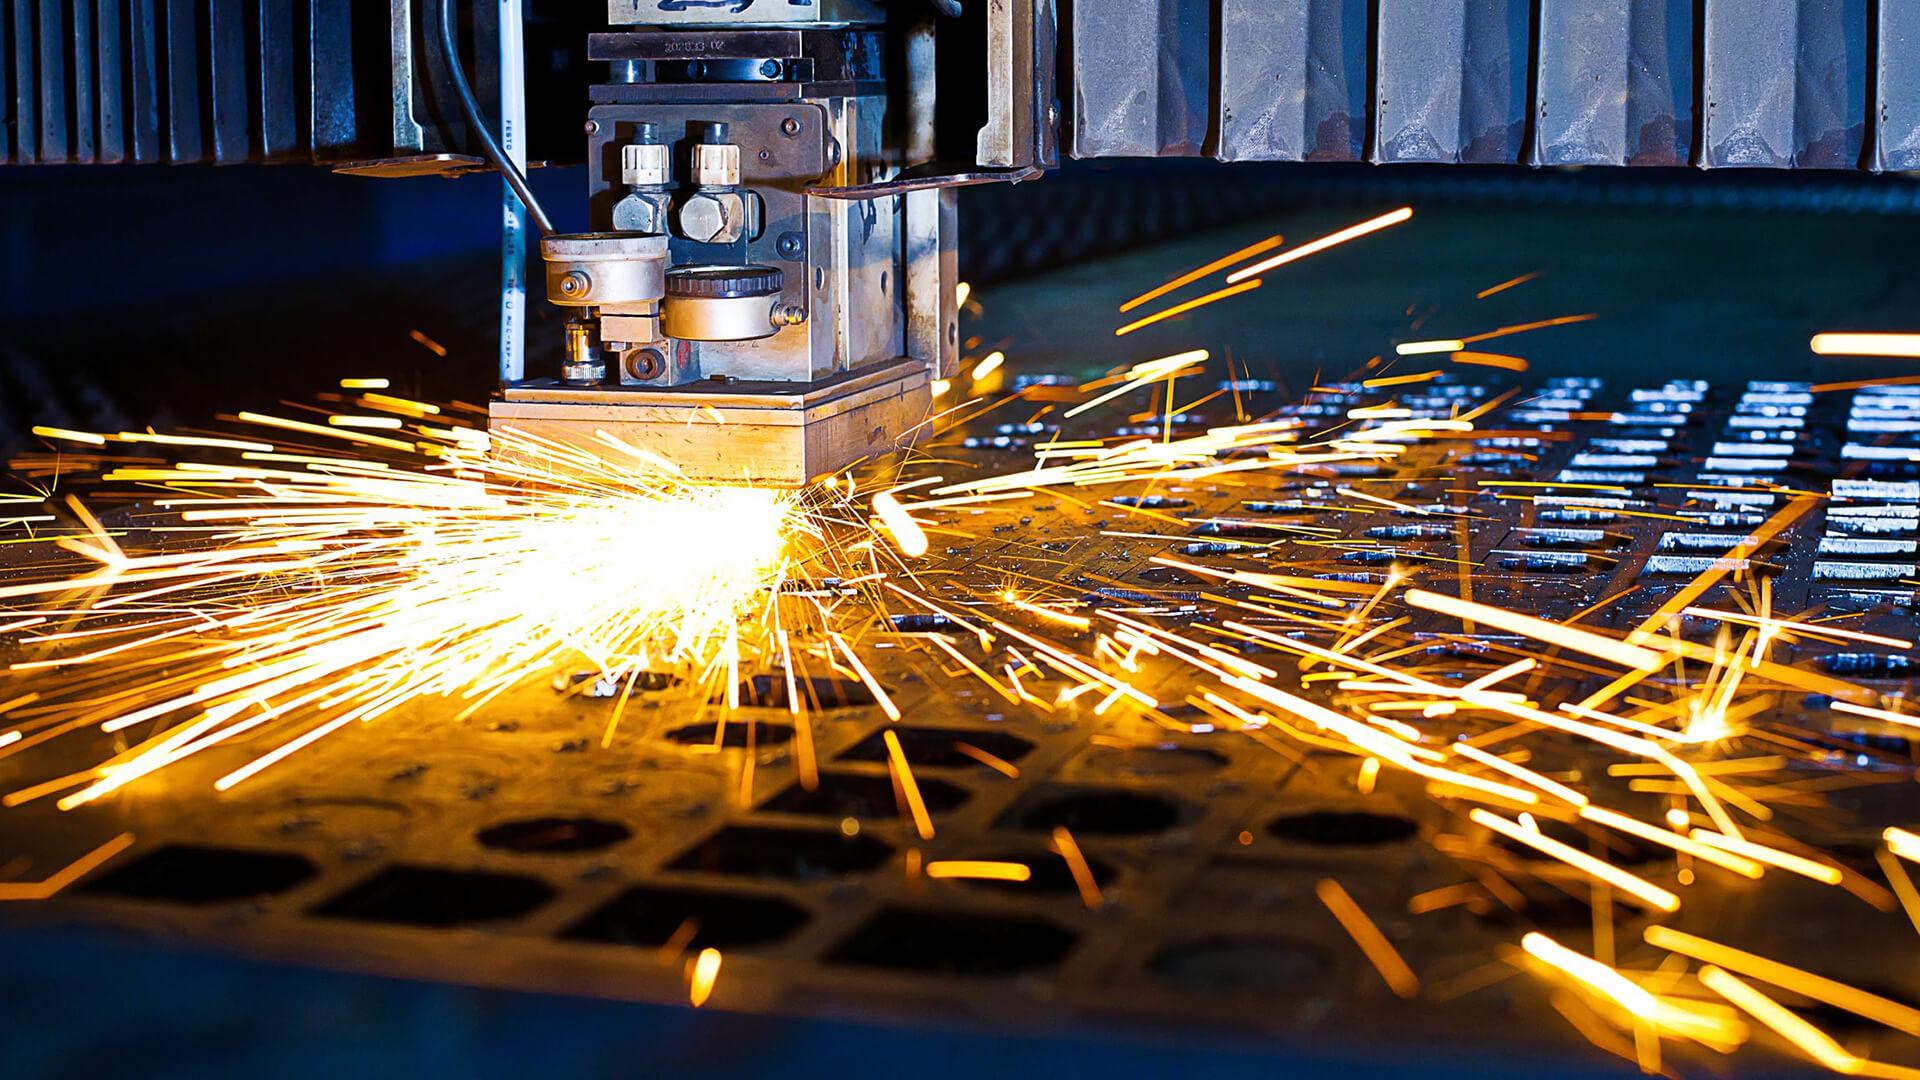 manufacturing-insurance-company-tyler-tx.jpg.pagespeed.ce.3fihBoss0_.jpg